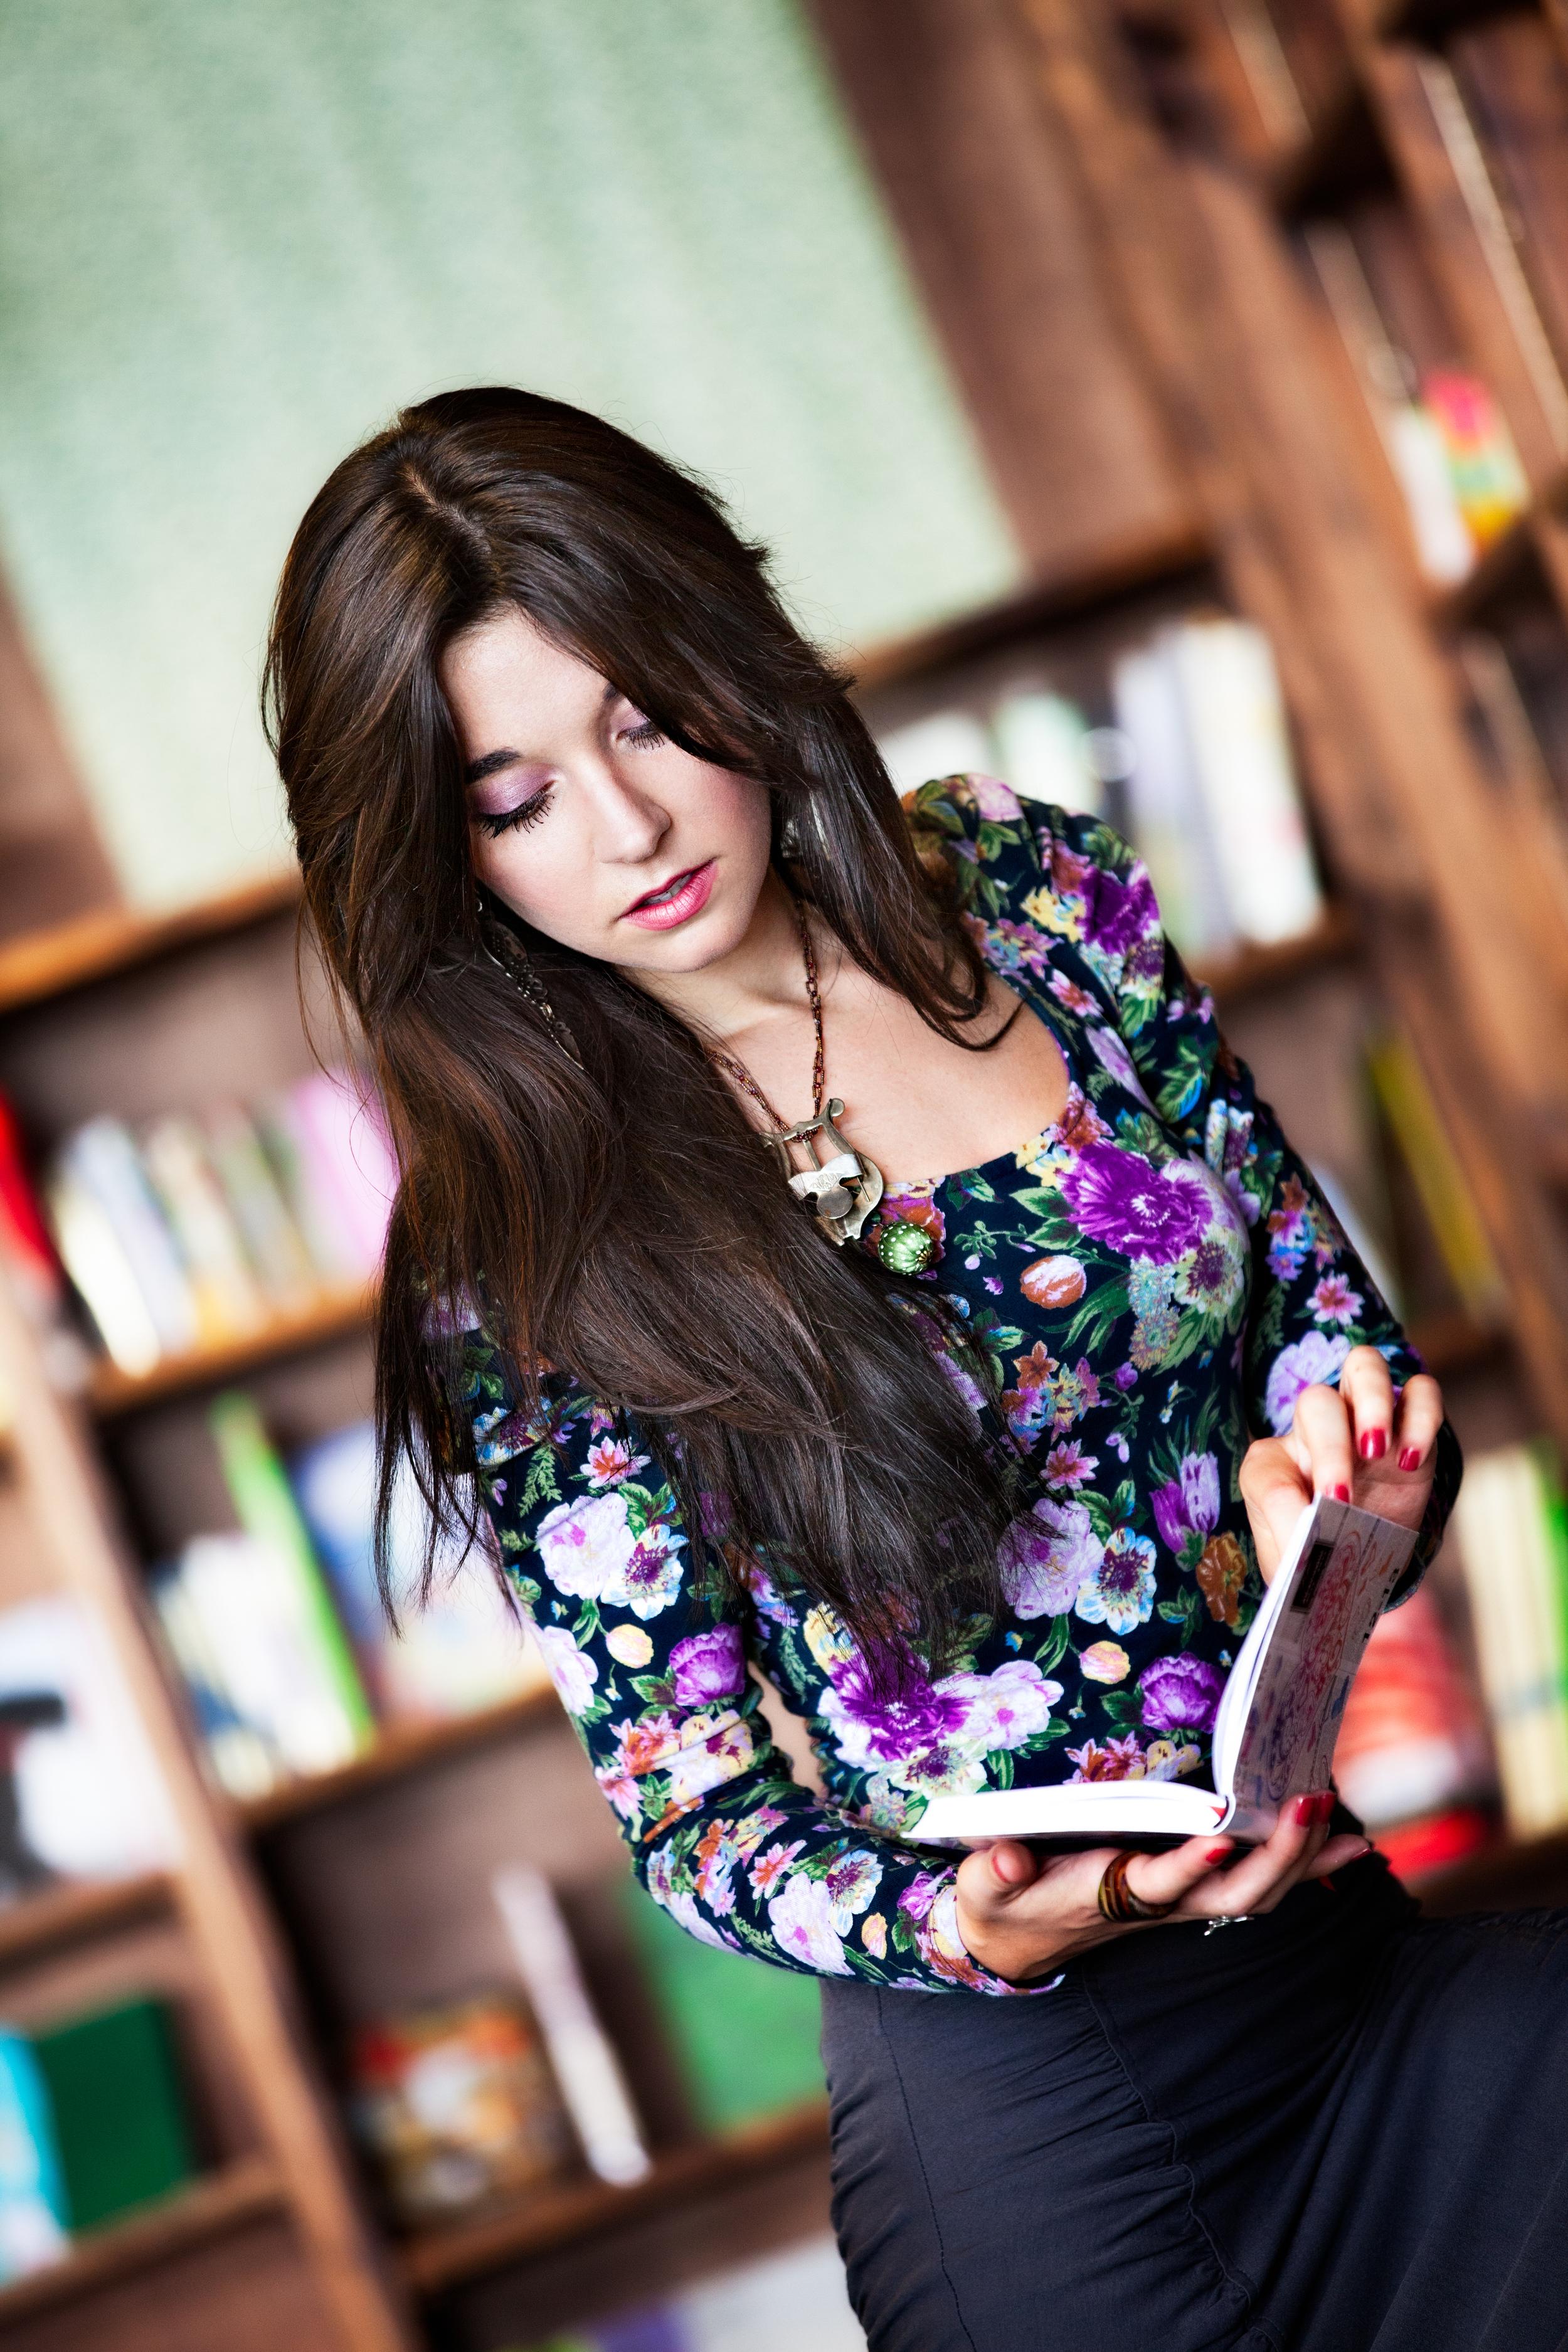 Photographer: Vidhi Thakur  Model: Talya Vylyt Location: Tattered Cover Book Store,  Denver, Colorado